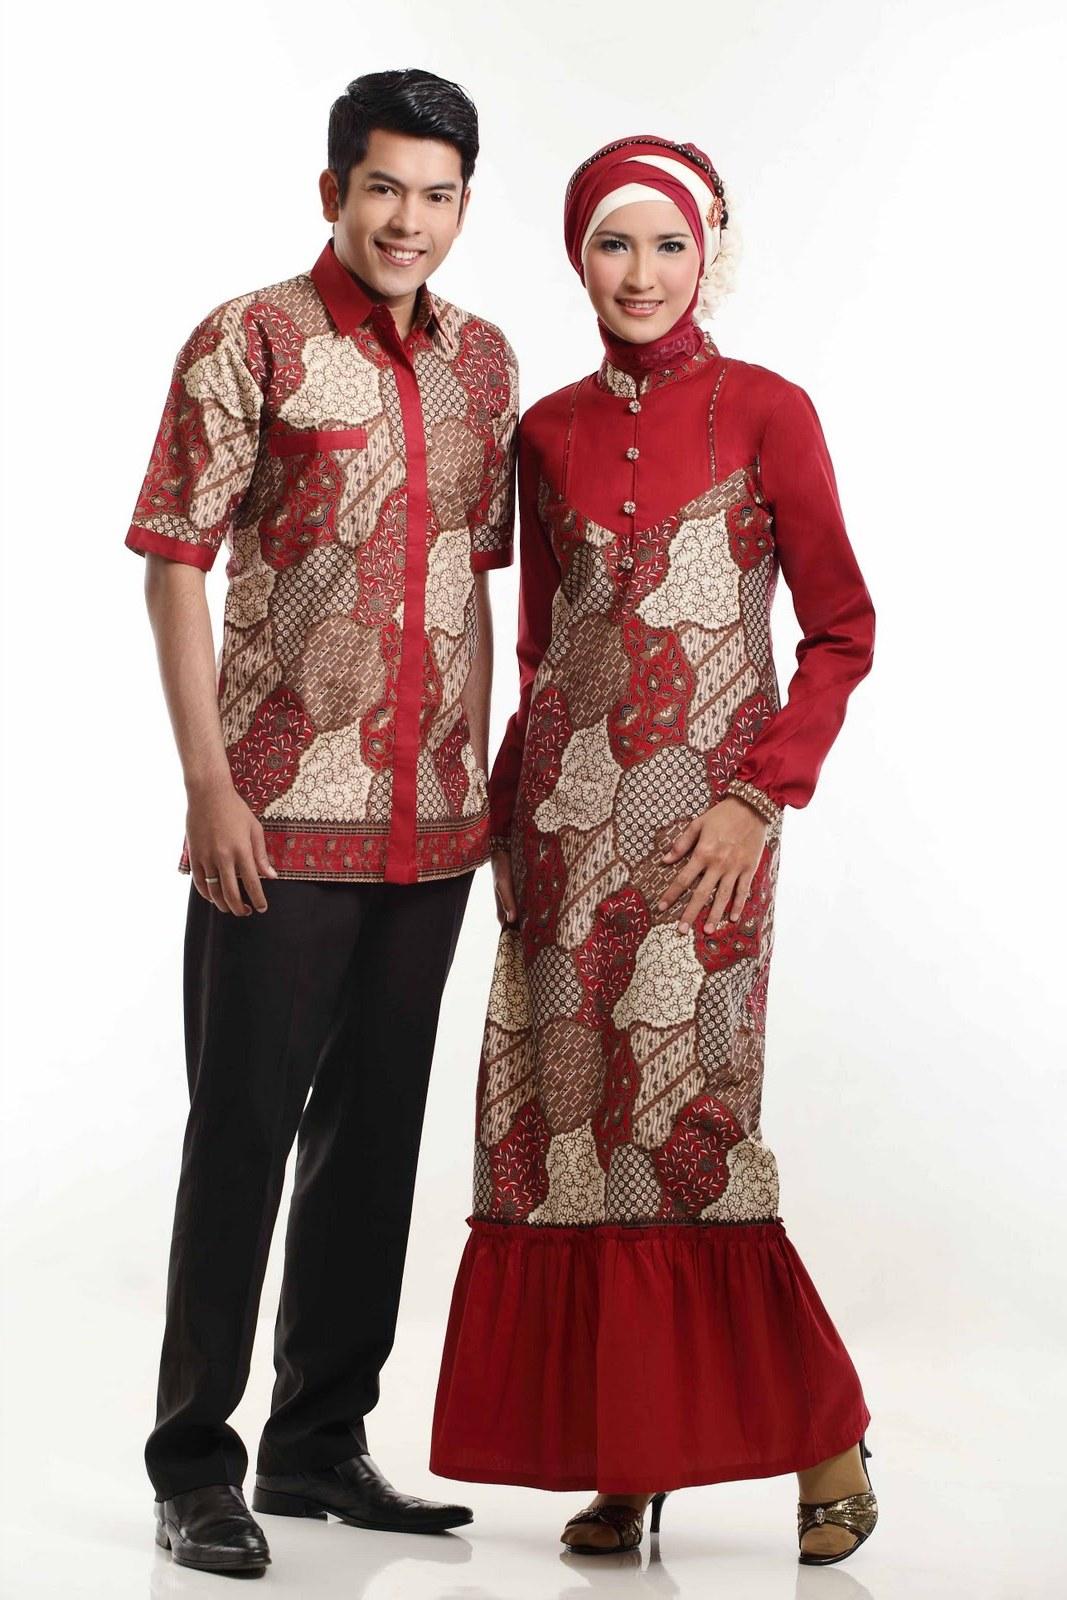 Design Model Baju Lebaran Batik E6d5 Bintang anda Trend Model Baju Batik Lebaran Terbaru 2013